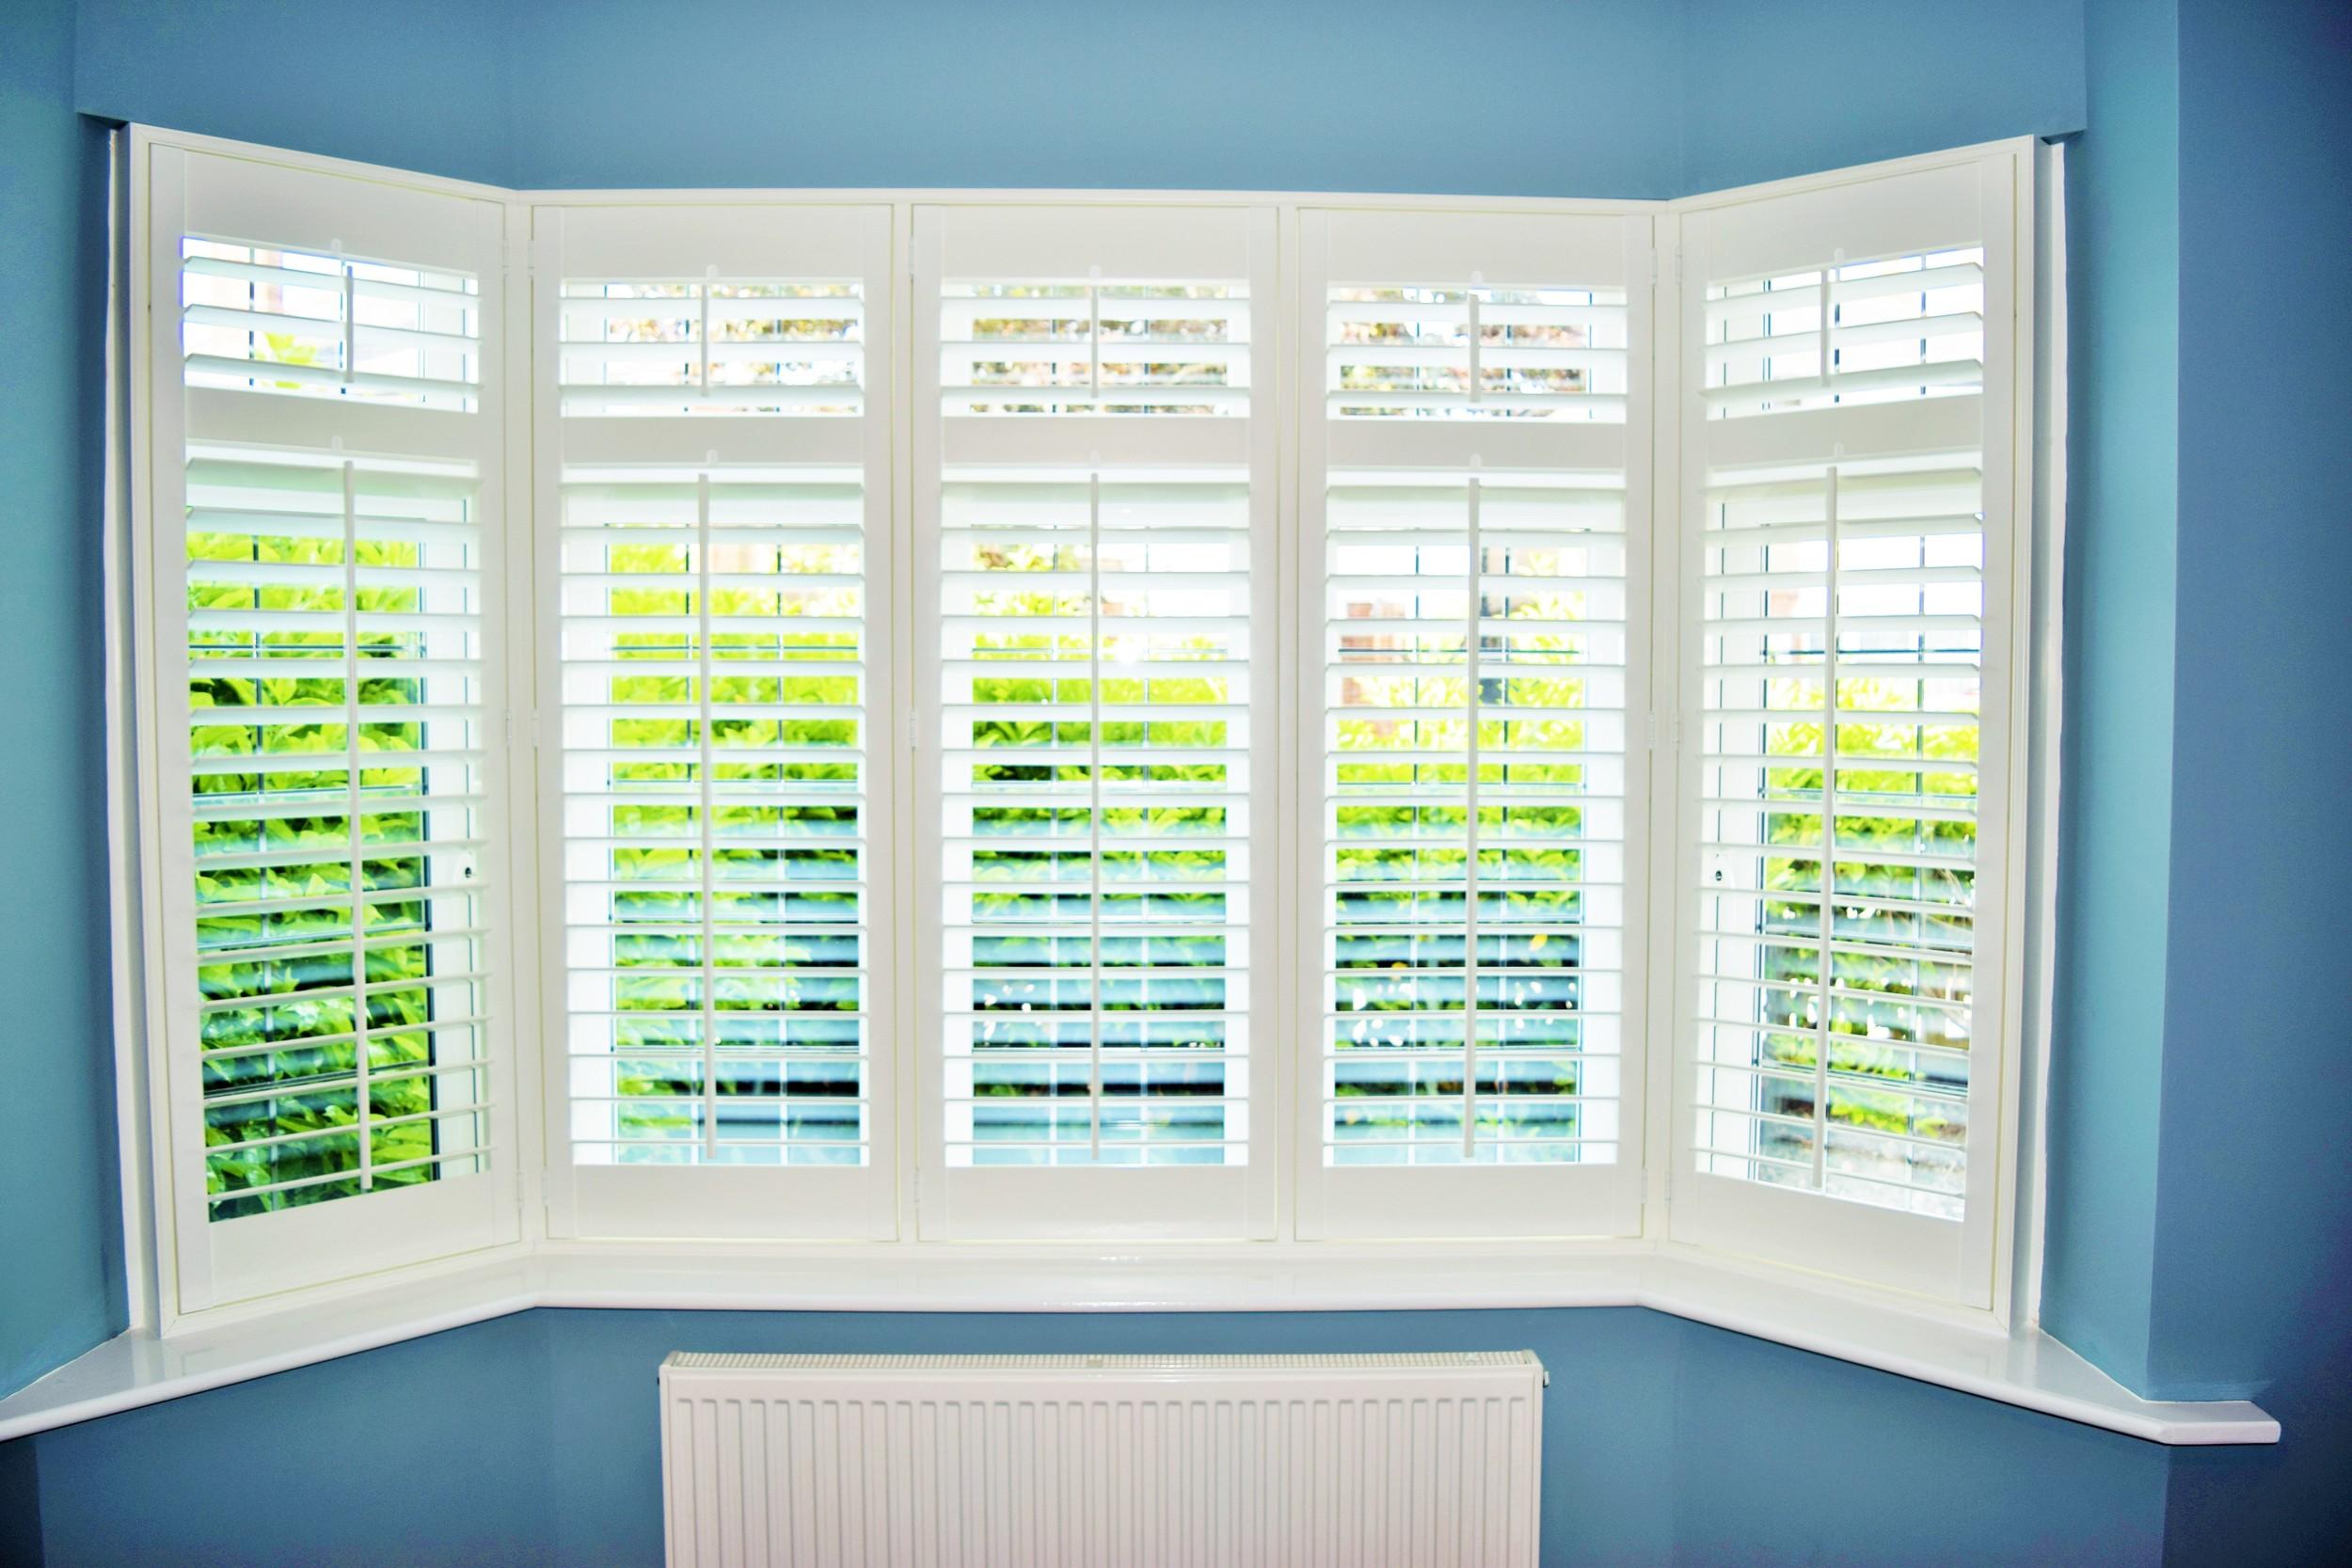 Bay window interior plantation shutters Bournemouth.JPG